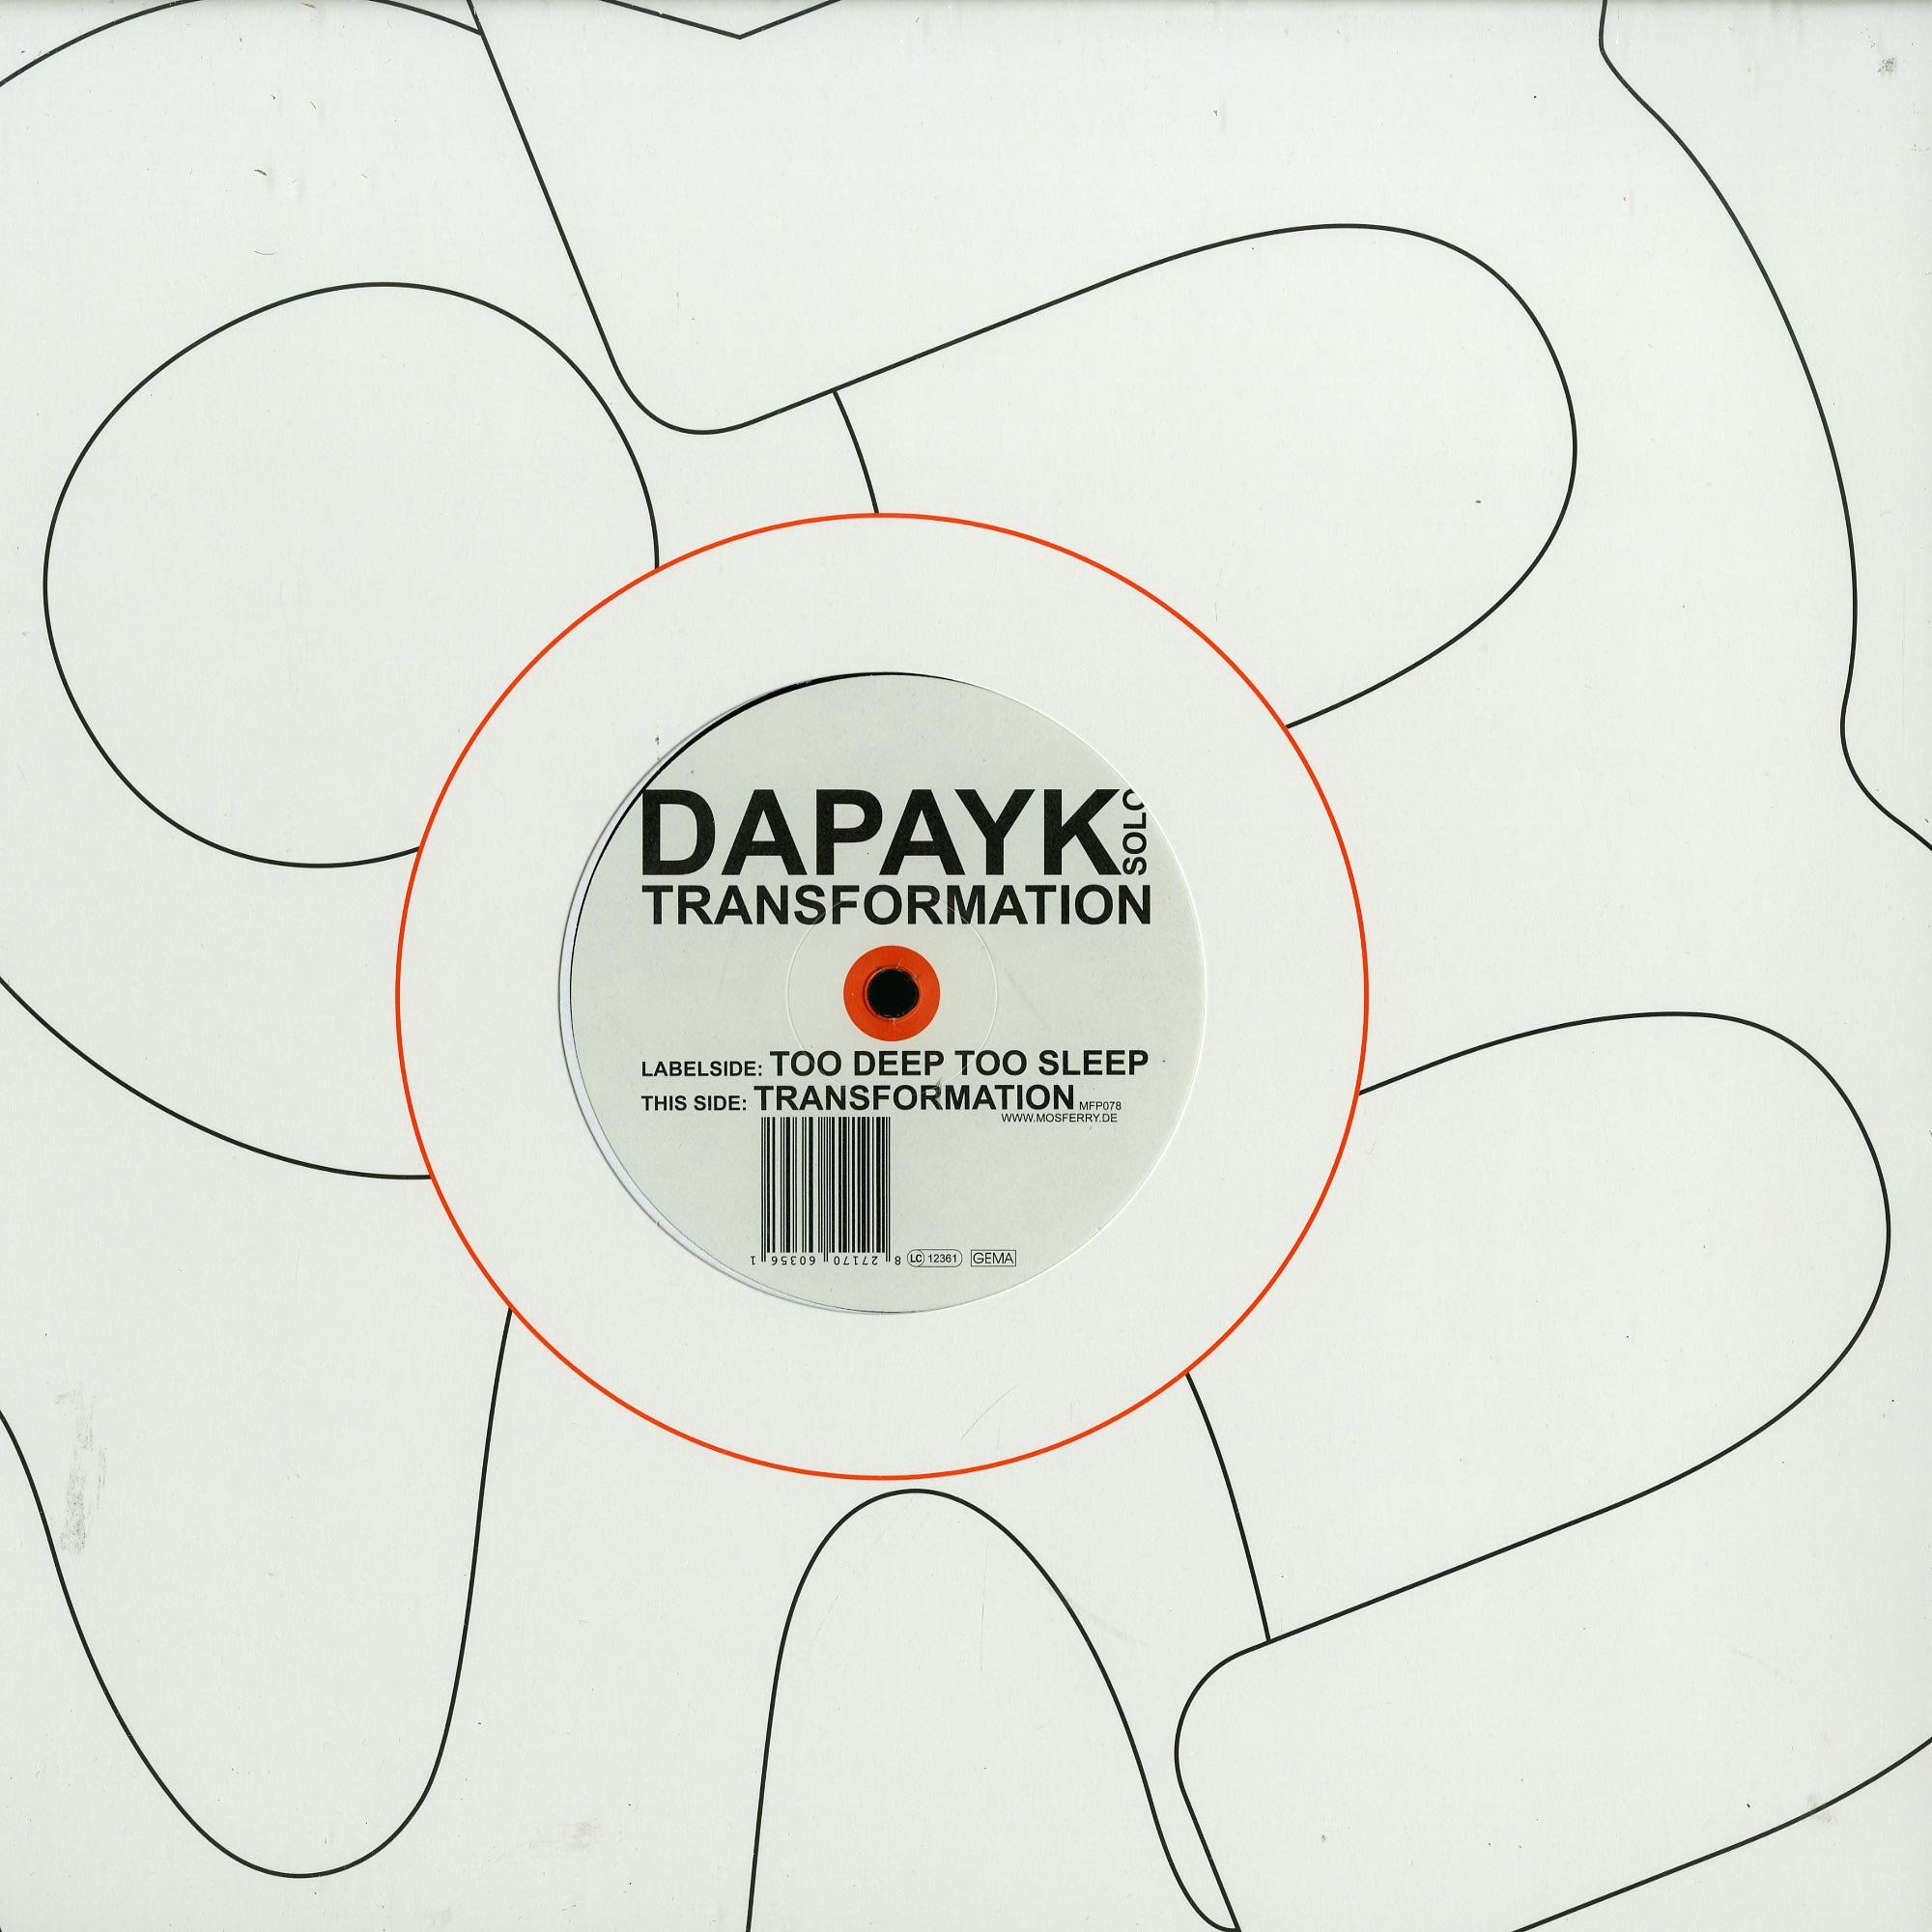 Dapayk Solo - TRANSFORMATION